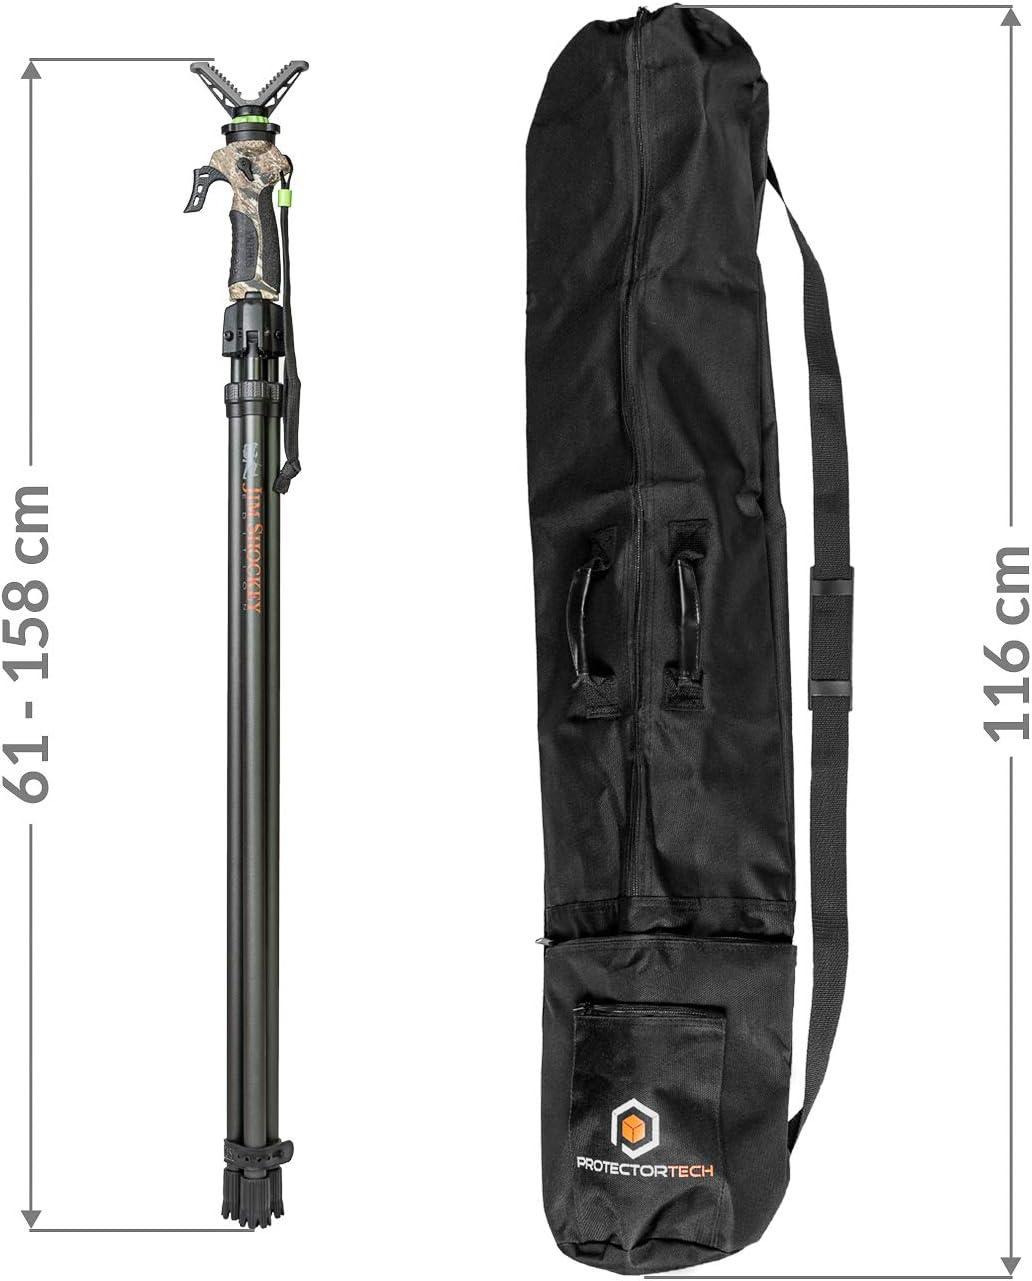 Primos Trigger Stick Gen 2 Deluxe Tripod Tall Hd Protective Case Sport Freizeit